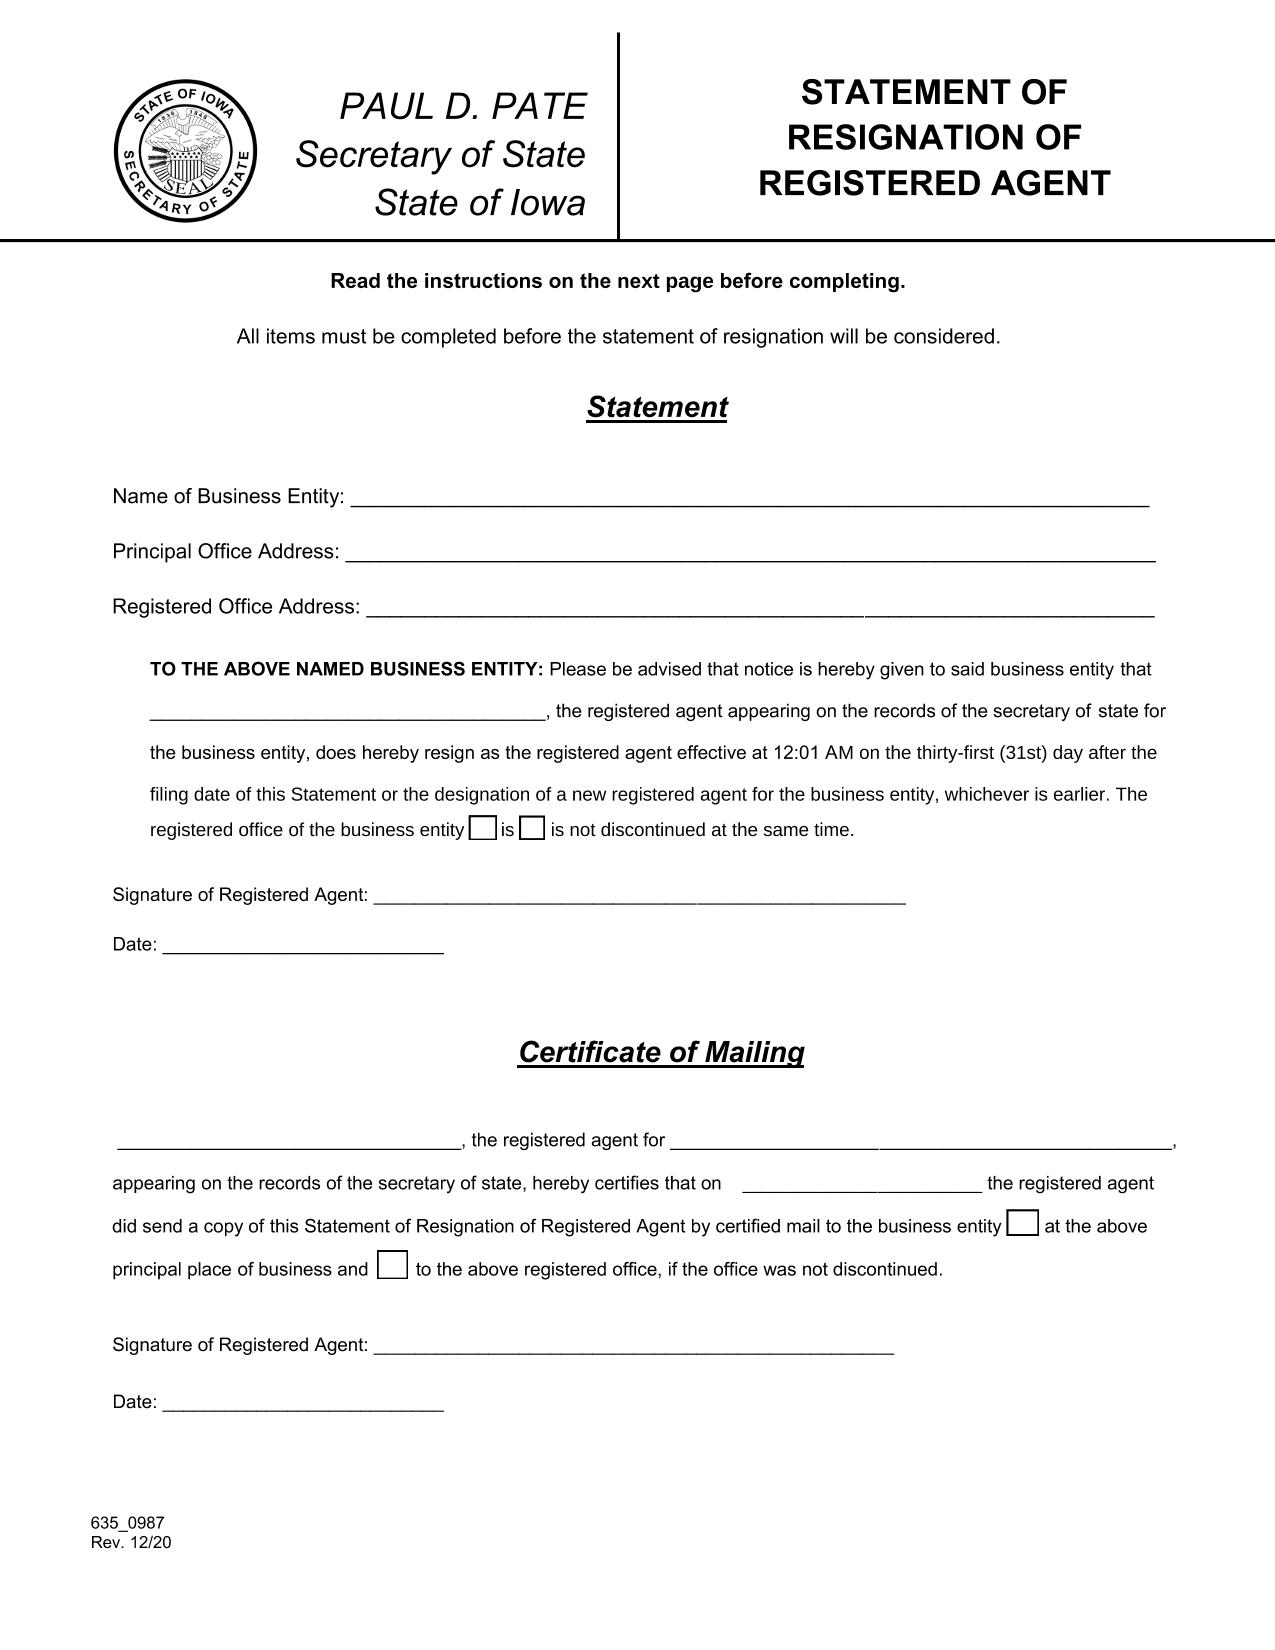 iowa-statement-of-resignation-of-registered-agent